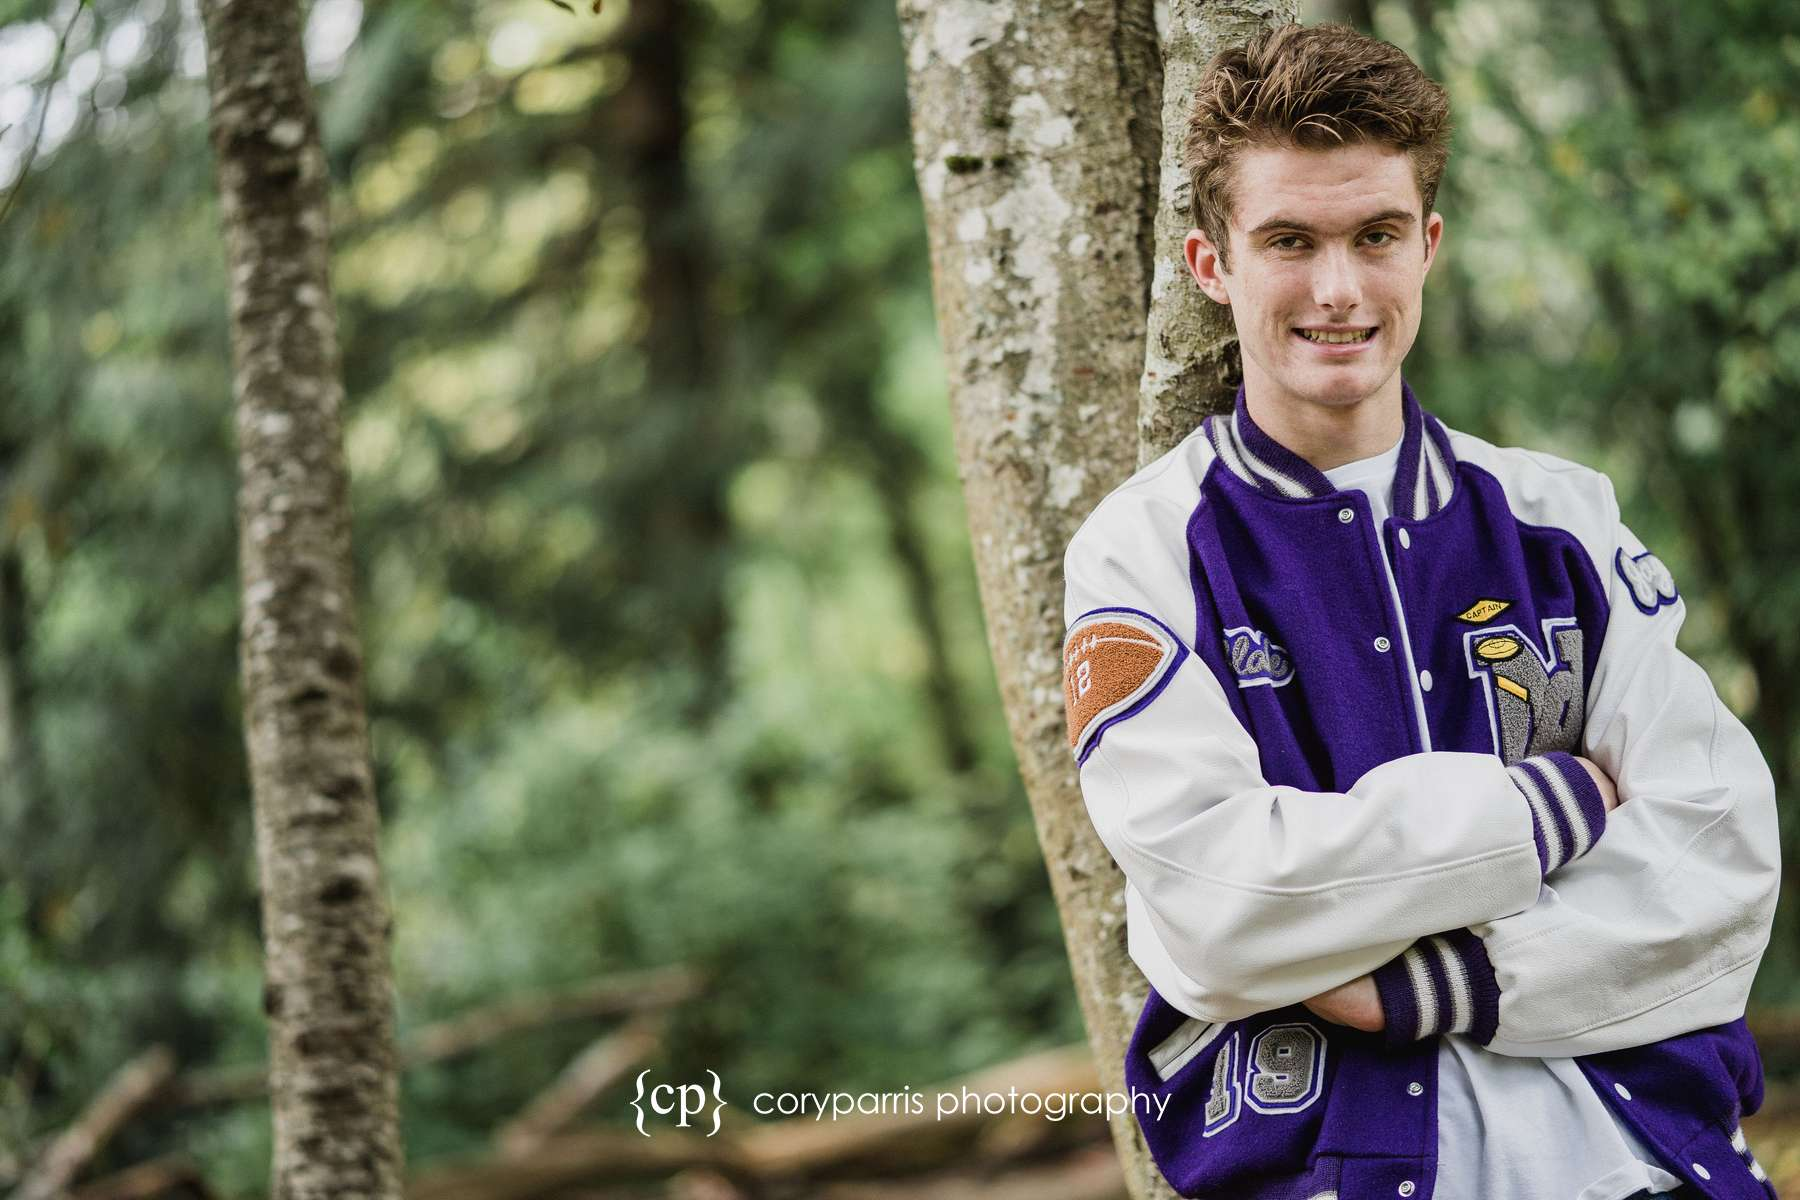 North-Creek-High-School-Senior-Portraits-Bothell-073.jpg